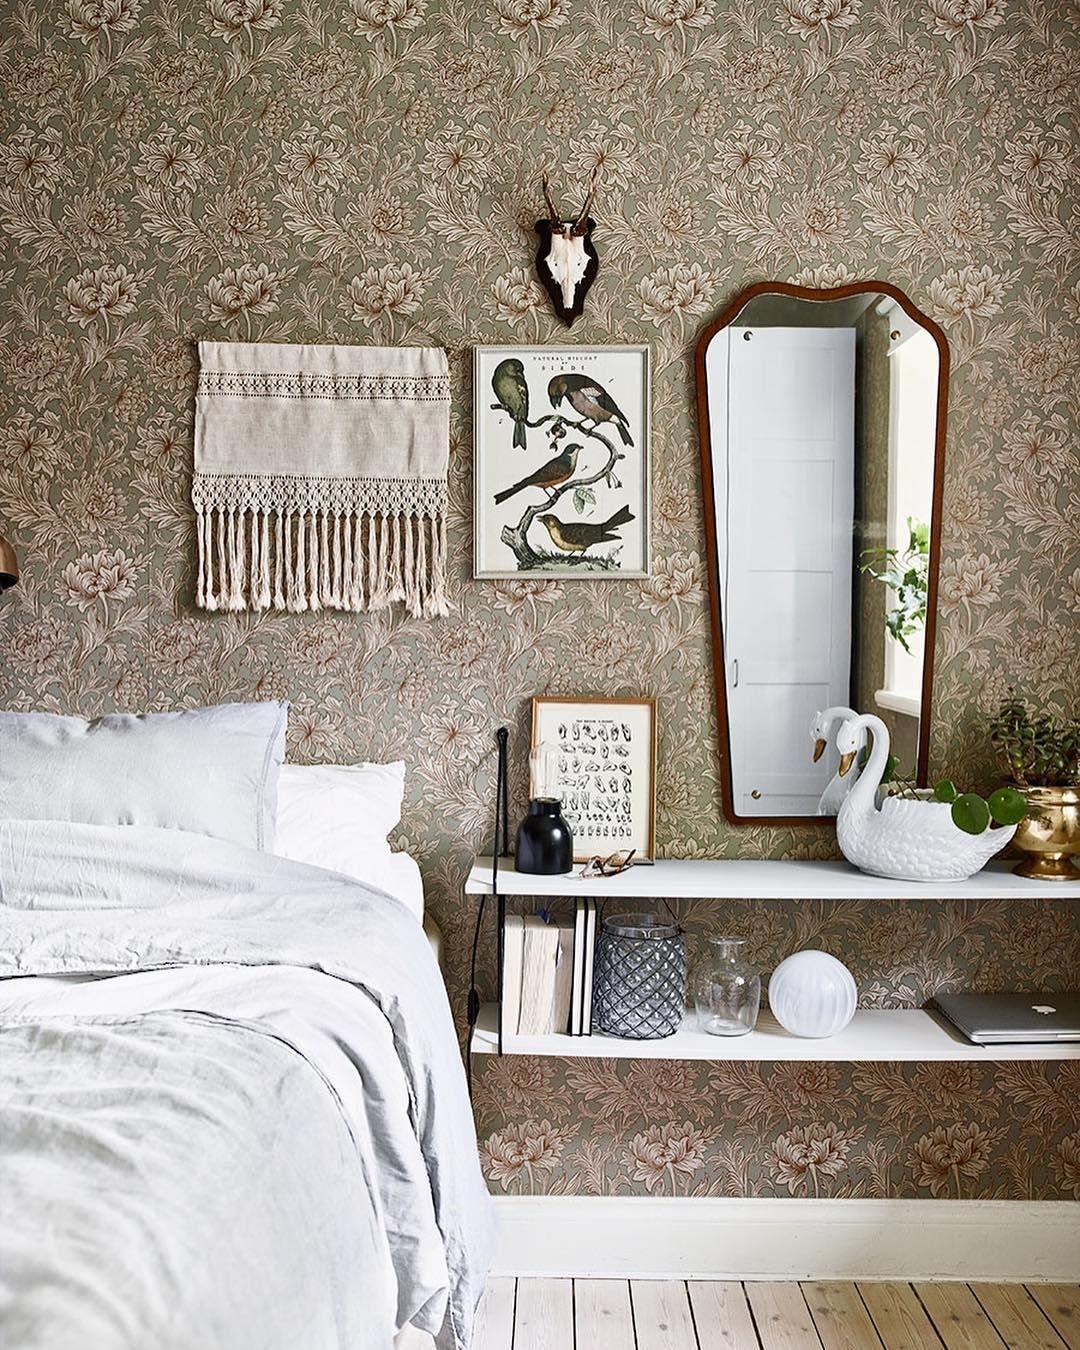 5 Ways to transform your bedroom - Vinterior Blog